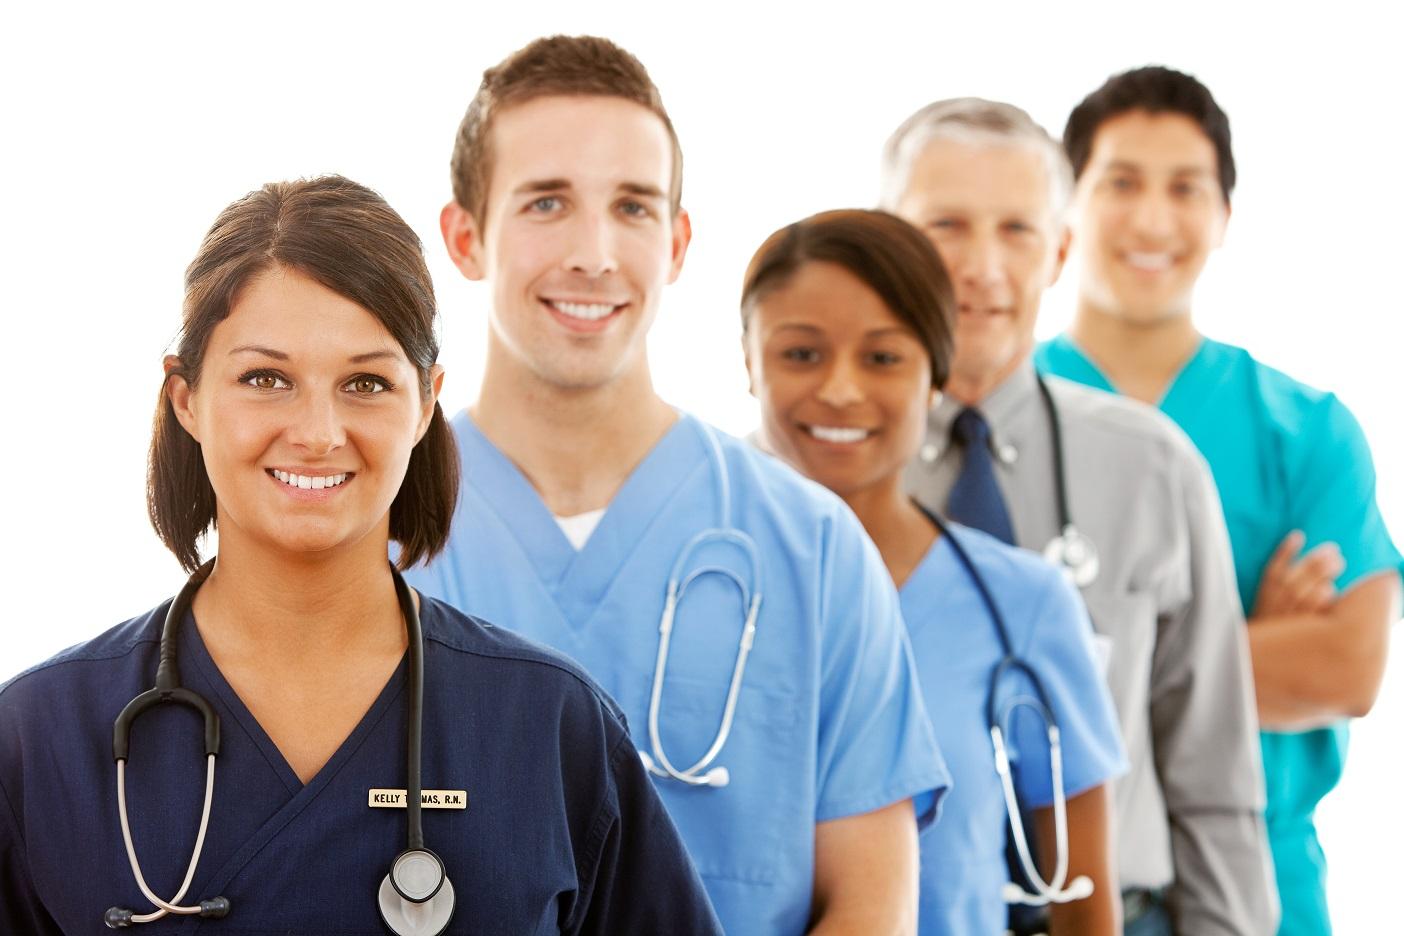 5 Best Ways to Level-Up Your Nursing Career - Nurseslabs